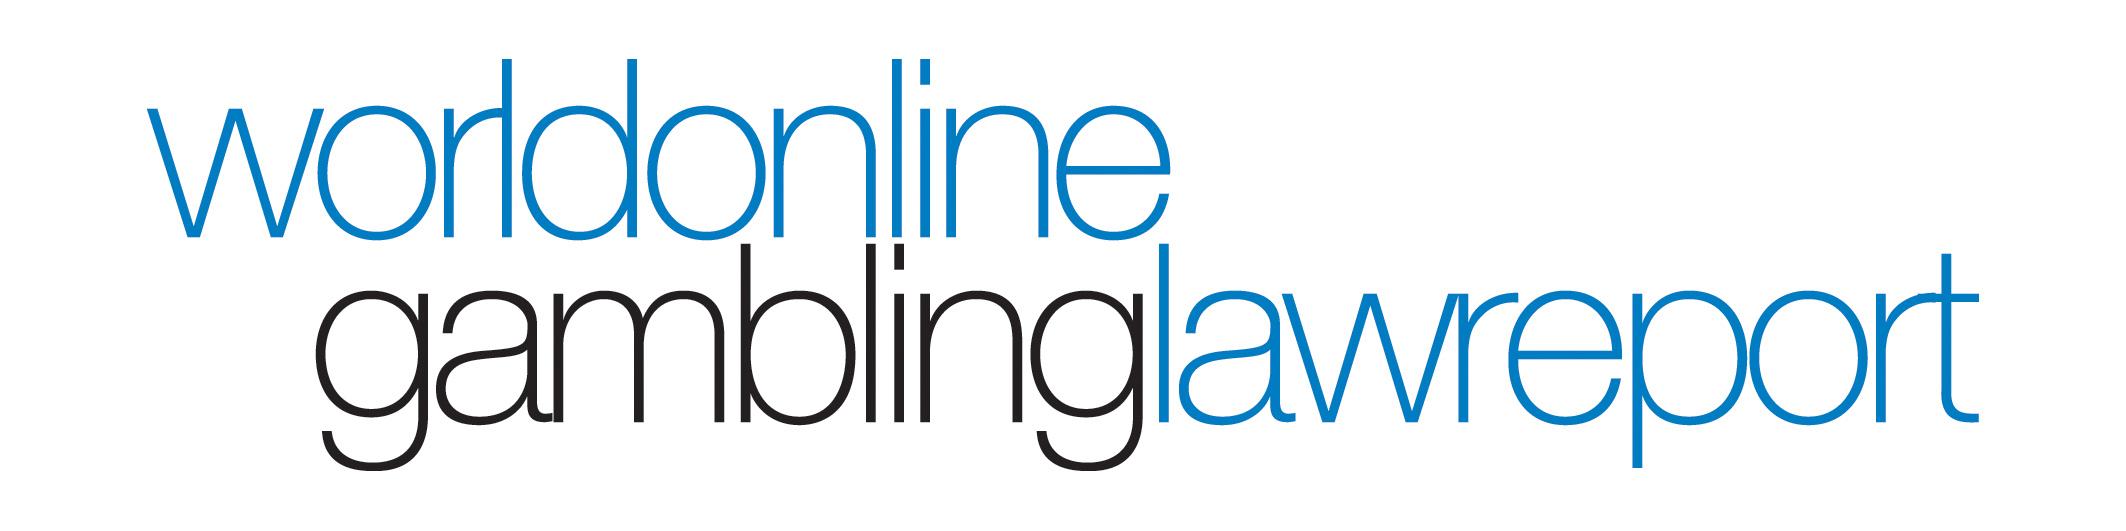 World Onling Gambling Law Report